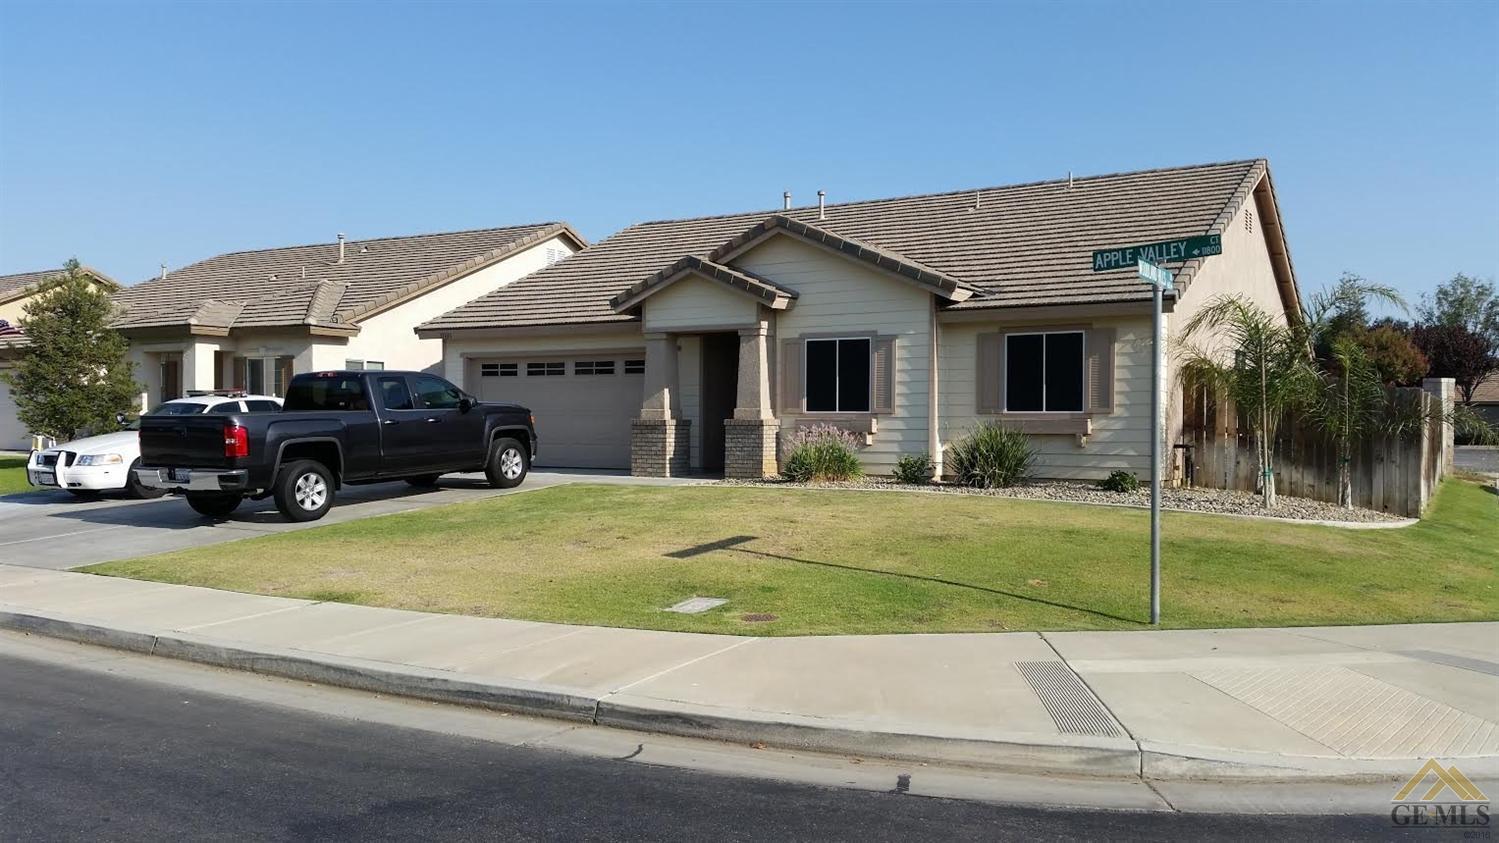 11813 Apple Valley Ct, Bakersfield, CA 93312